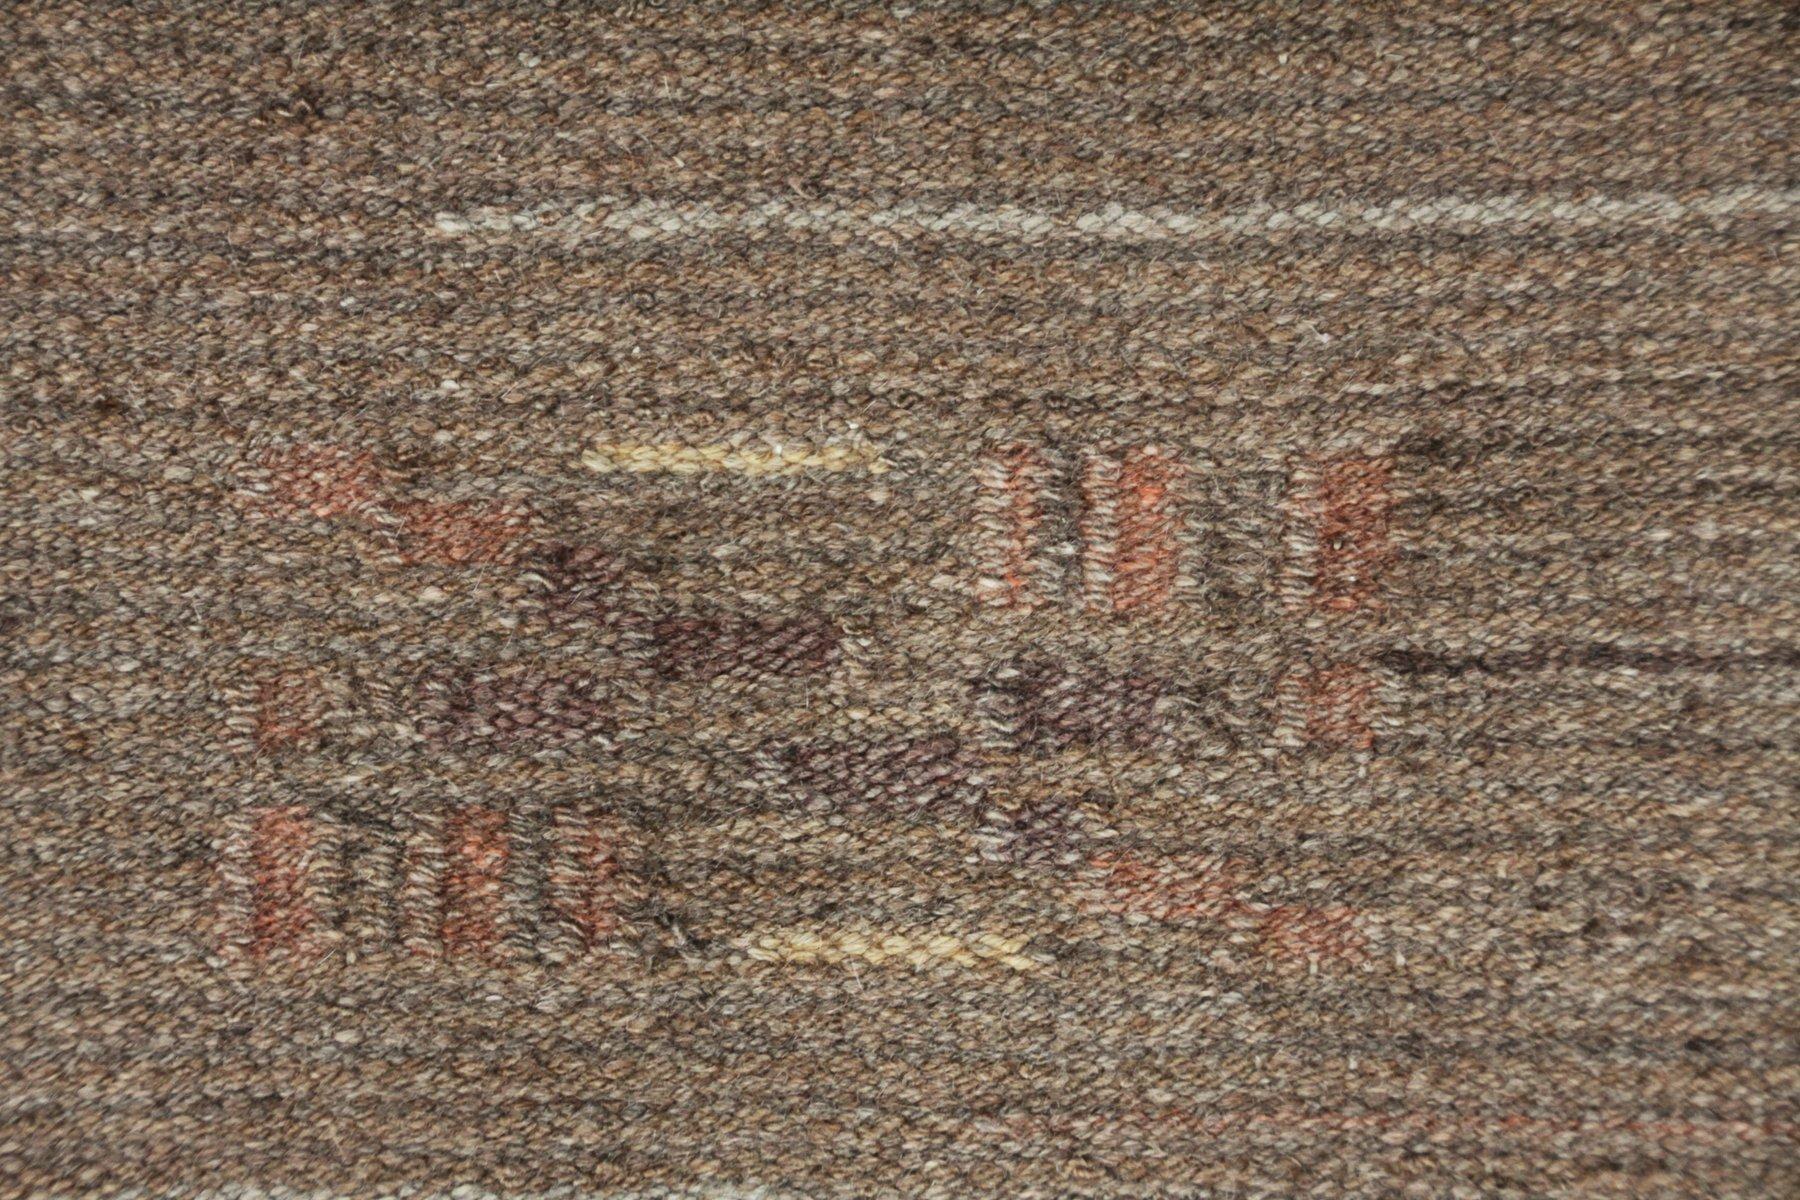 finnischer art deco flachgewebe teppich 1930er bei pamono. Black Bedroom Furniture Sets. Home Design Ideas